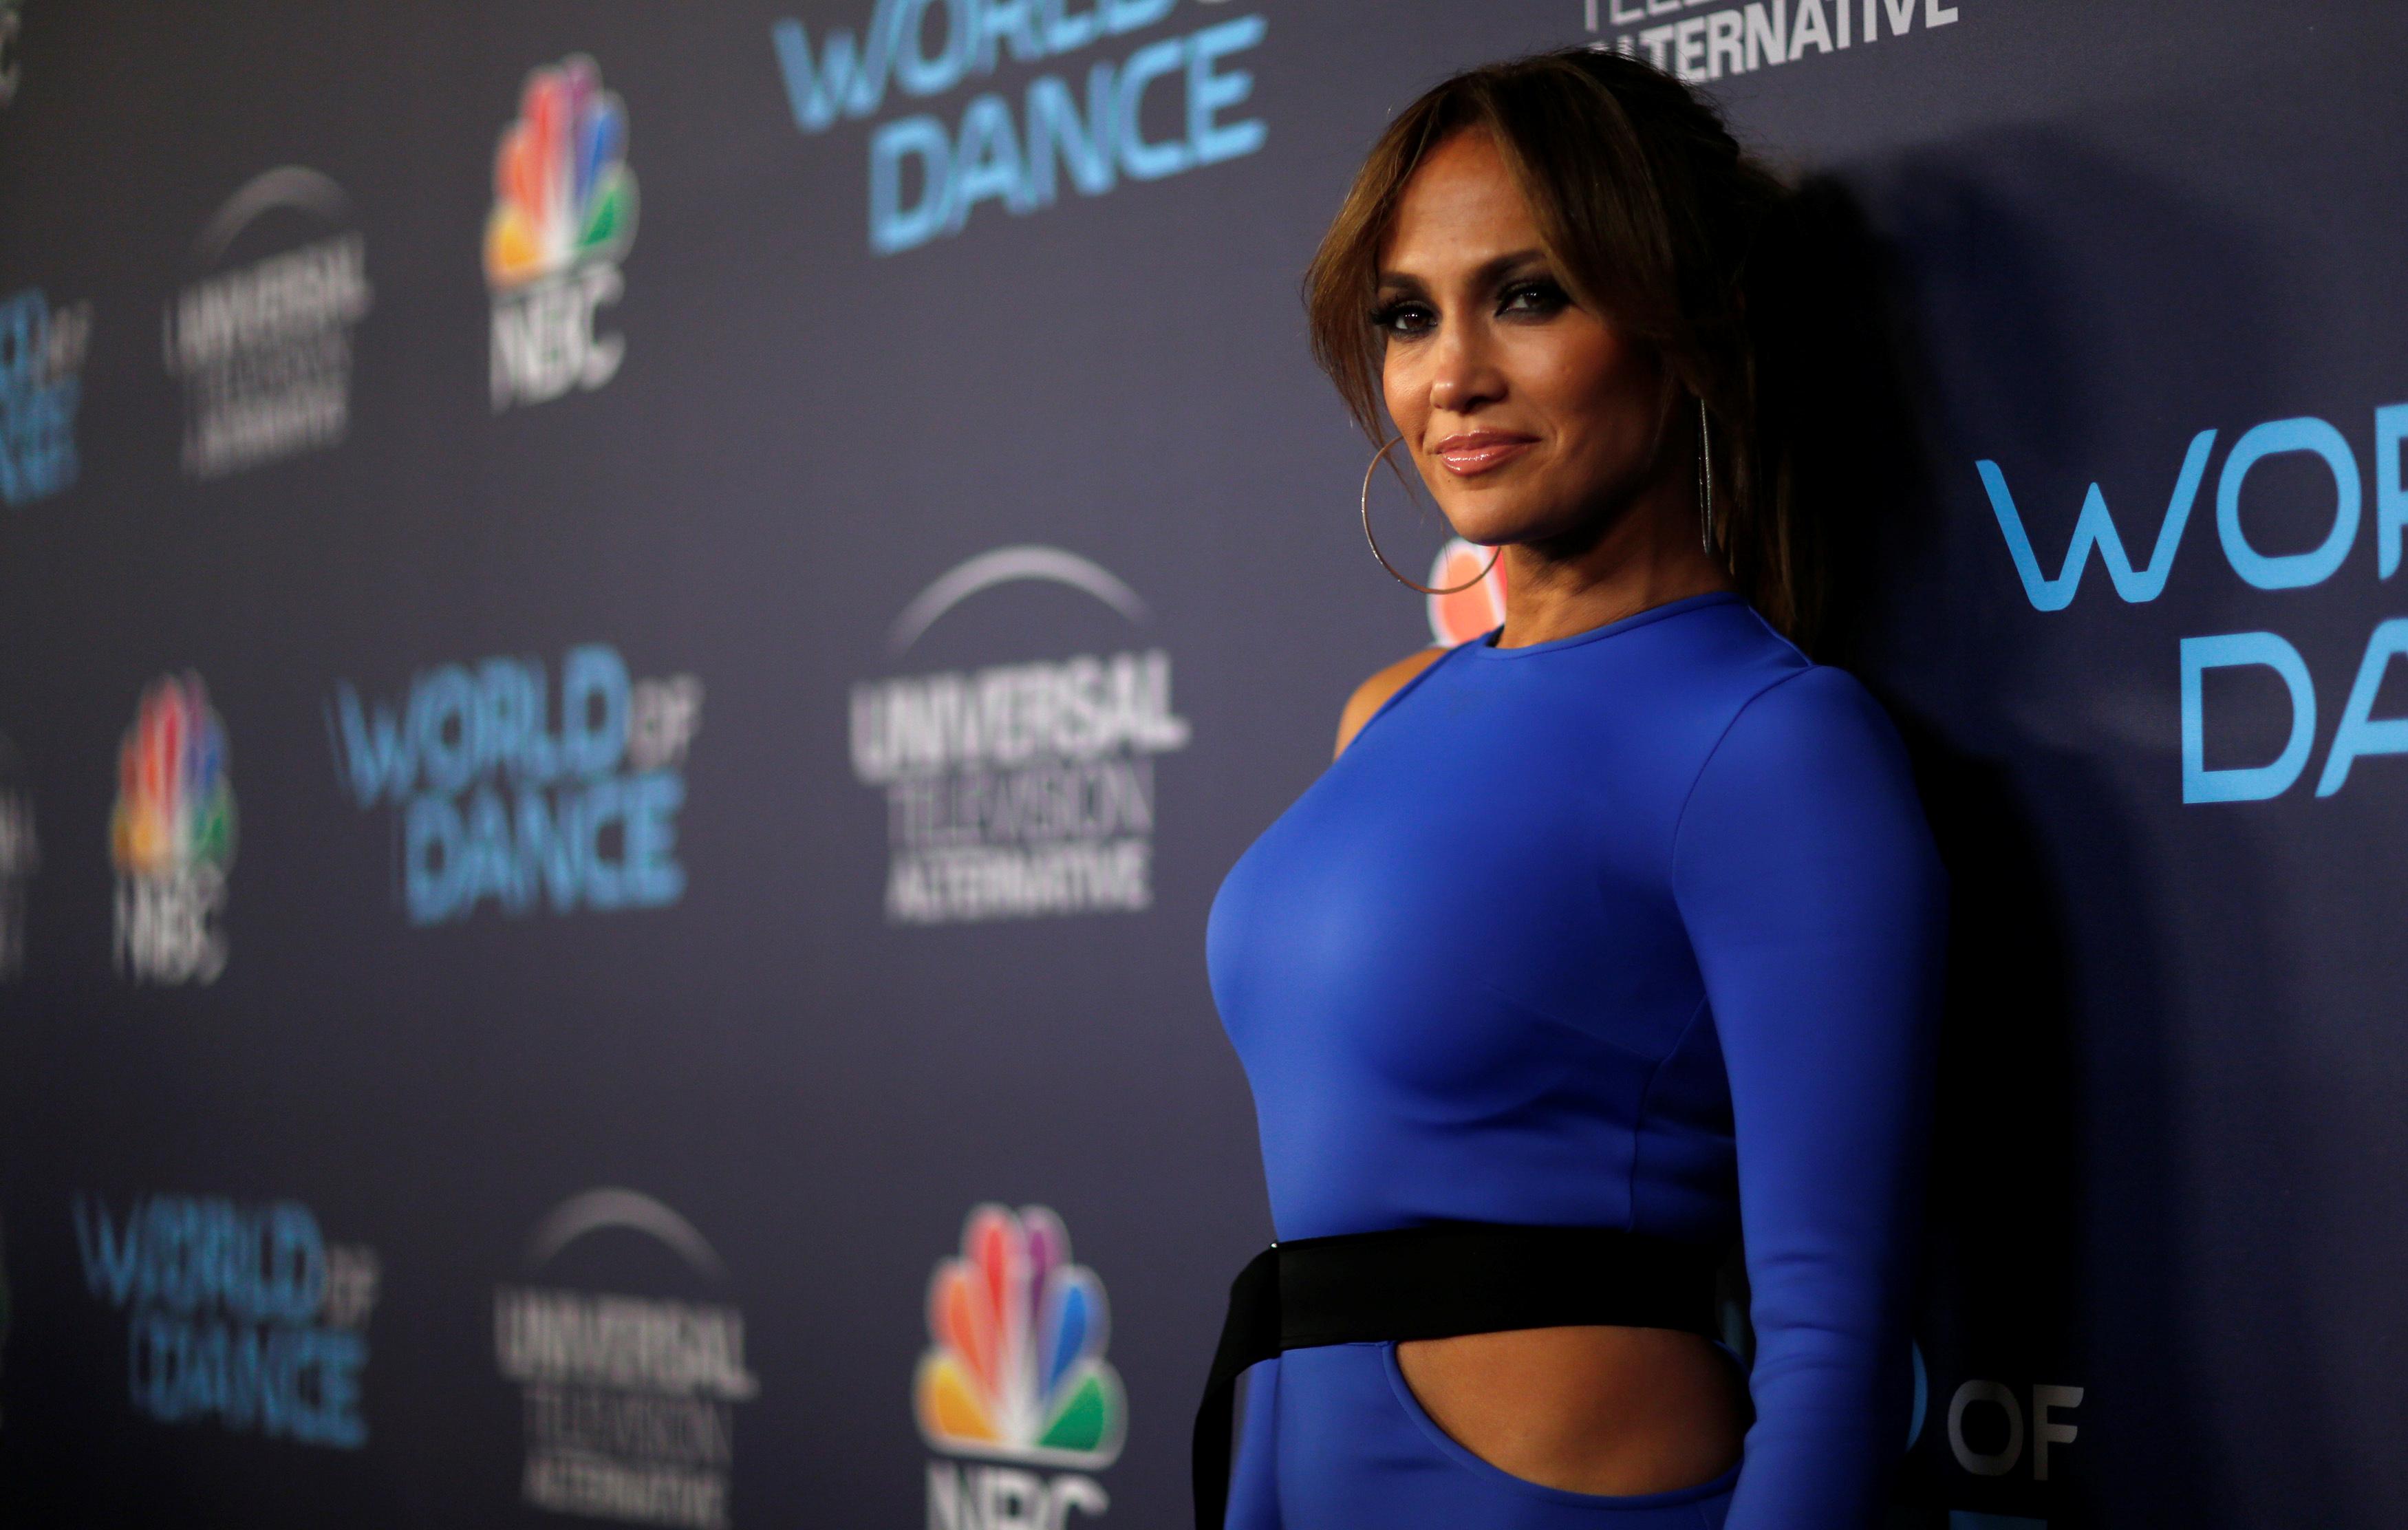 Jennifer Lopez Postpones Las Vegas Shows Due To Sunday's Shooting